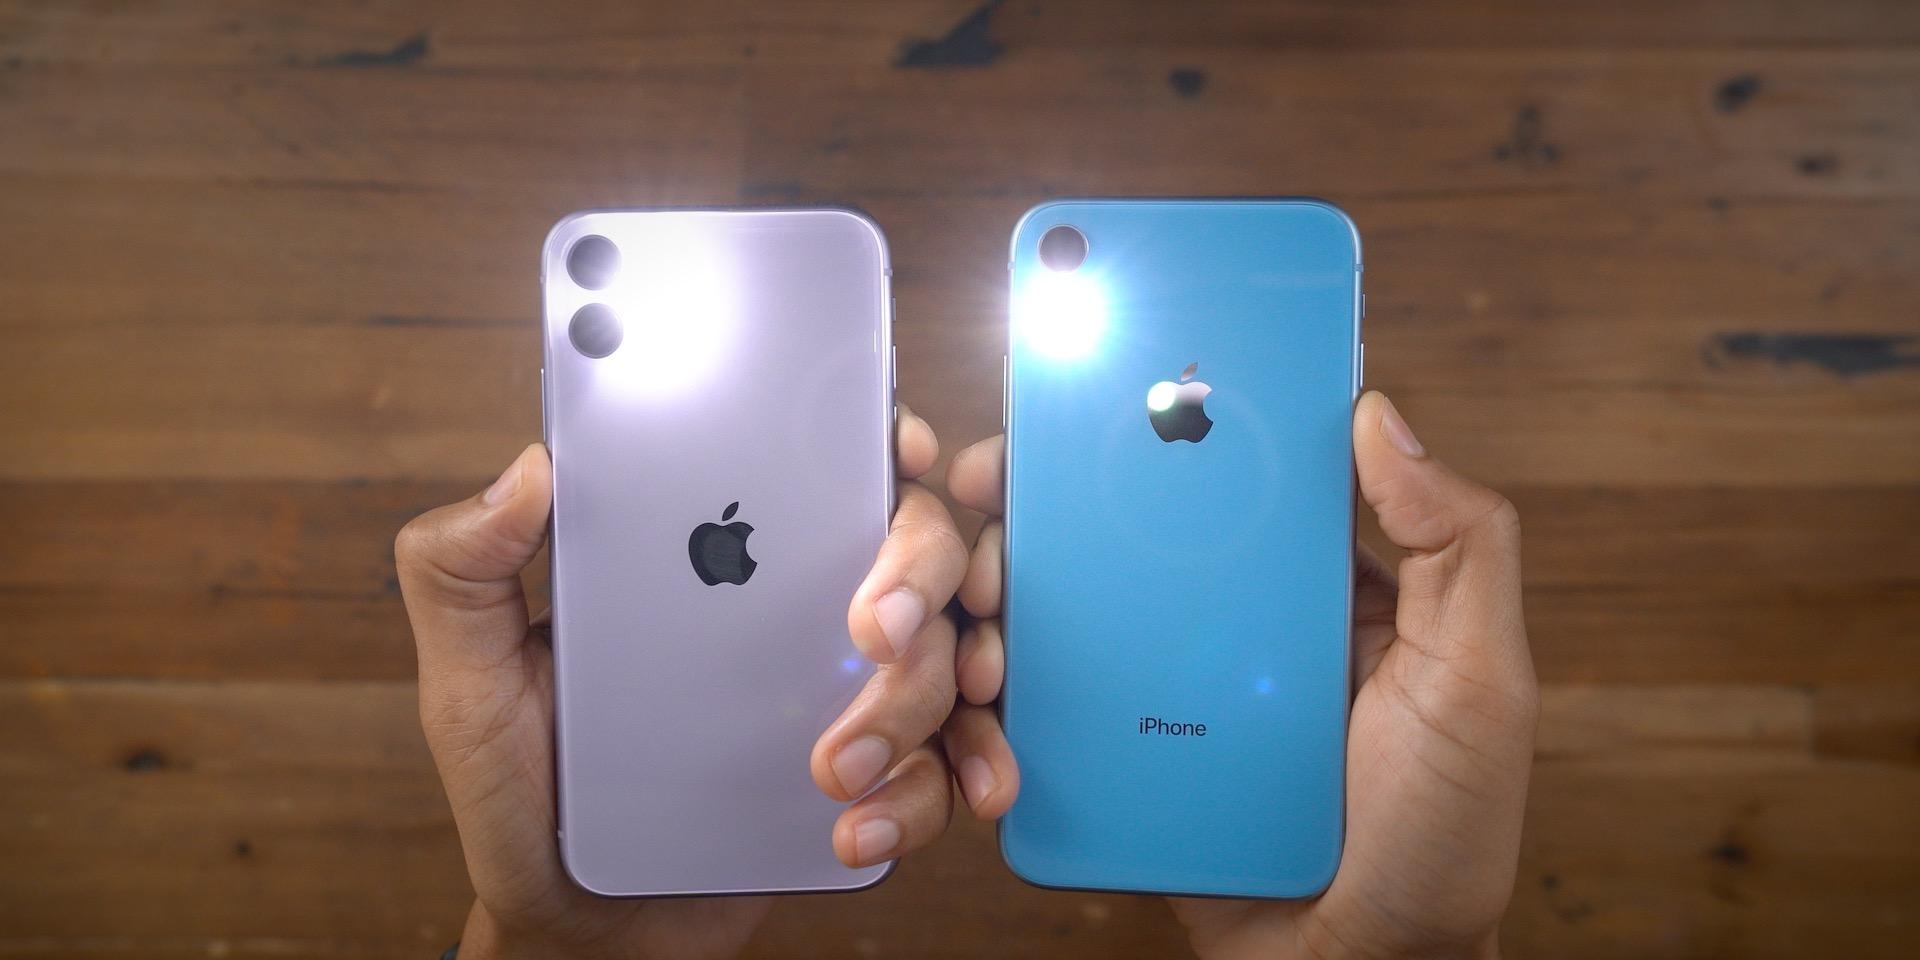 iPhone 11 True Tone Flash vs iPhone XR